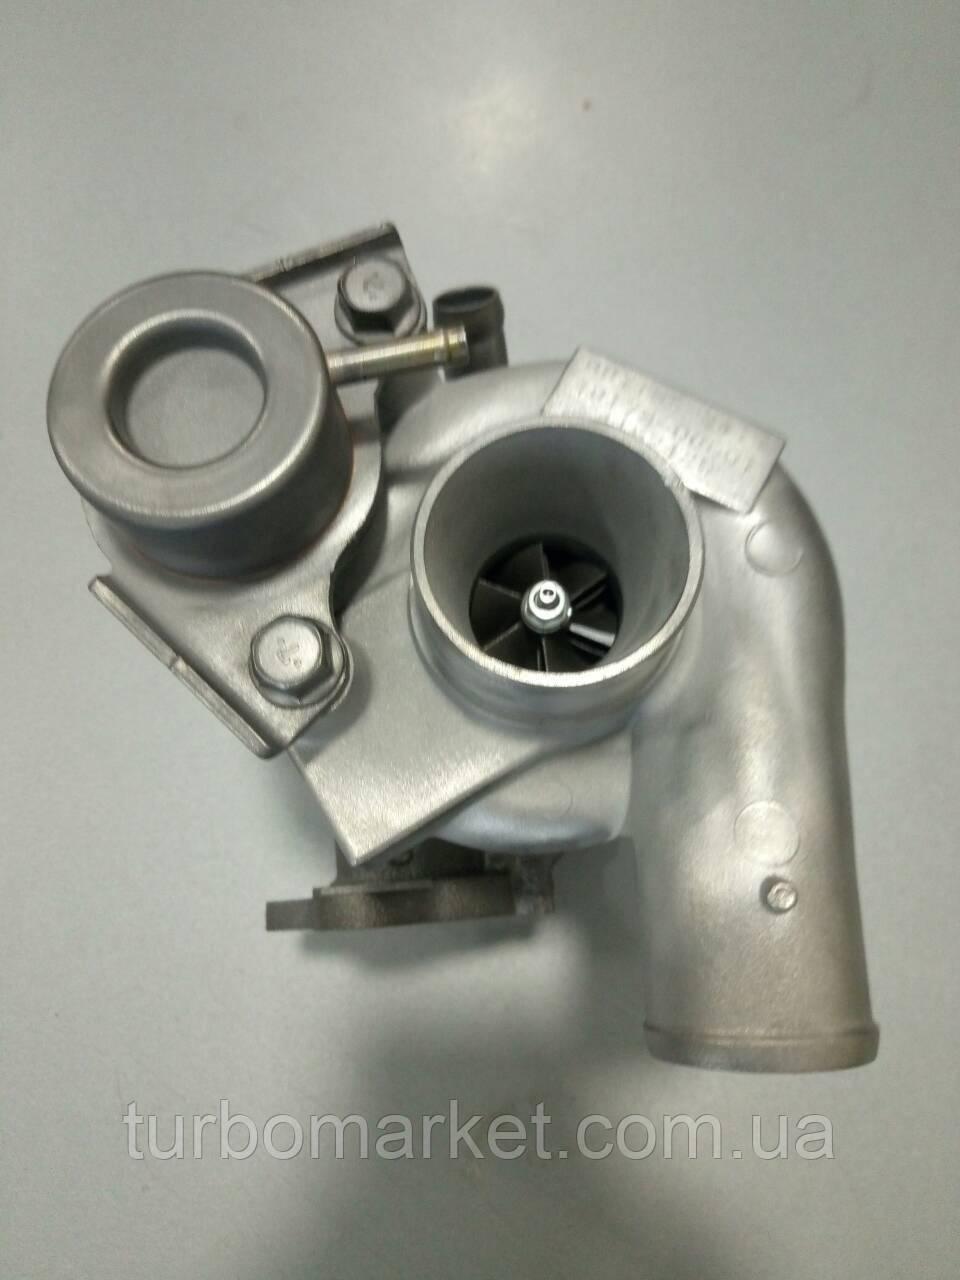 Турбина турбокомпрессор Opel Astra 1.7 опель астра  / Opel Combo, опель комбо 1.7  49173-06501 49173-06500